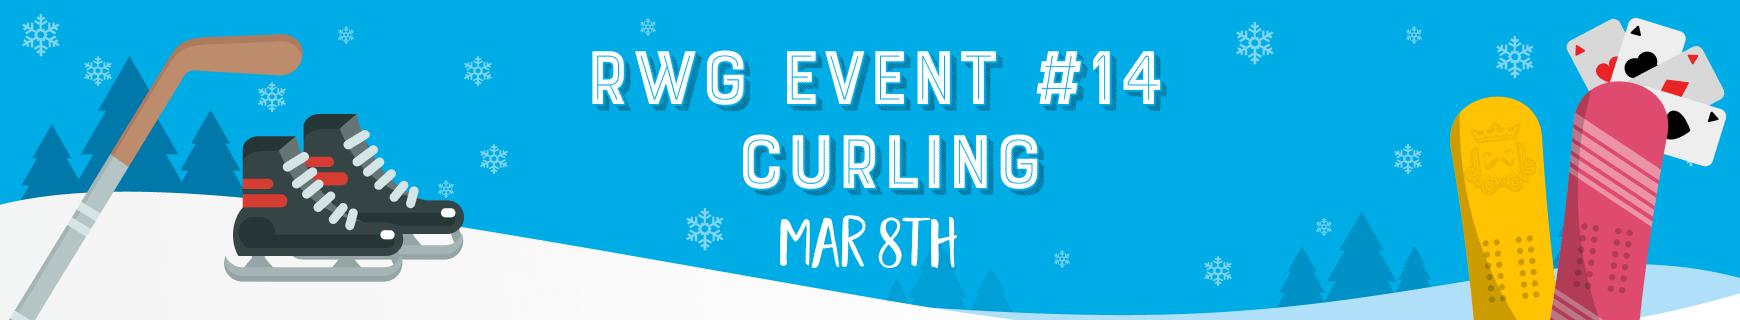 Replay winter games   14   curling   dashboard %28870 x 160%29 x2